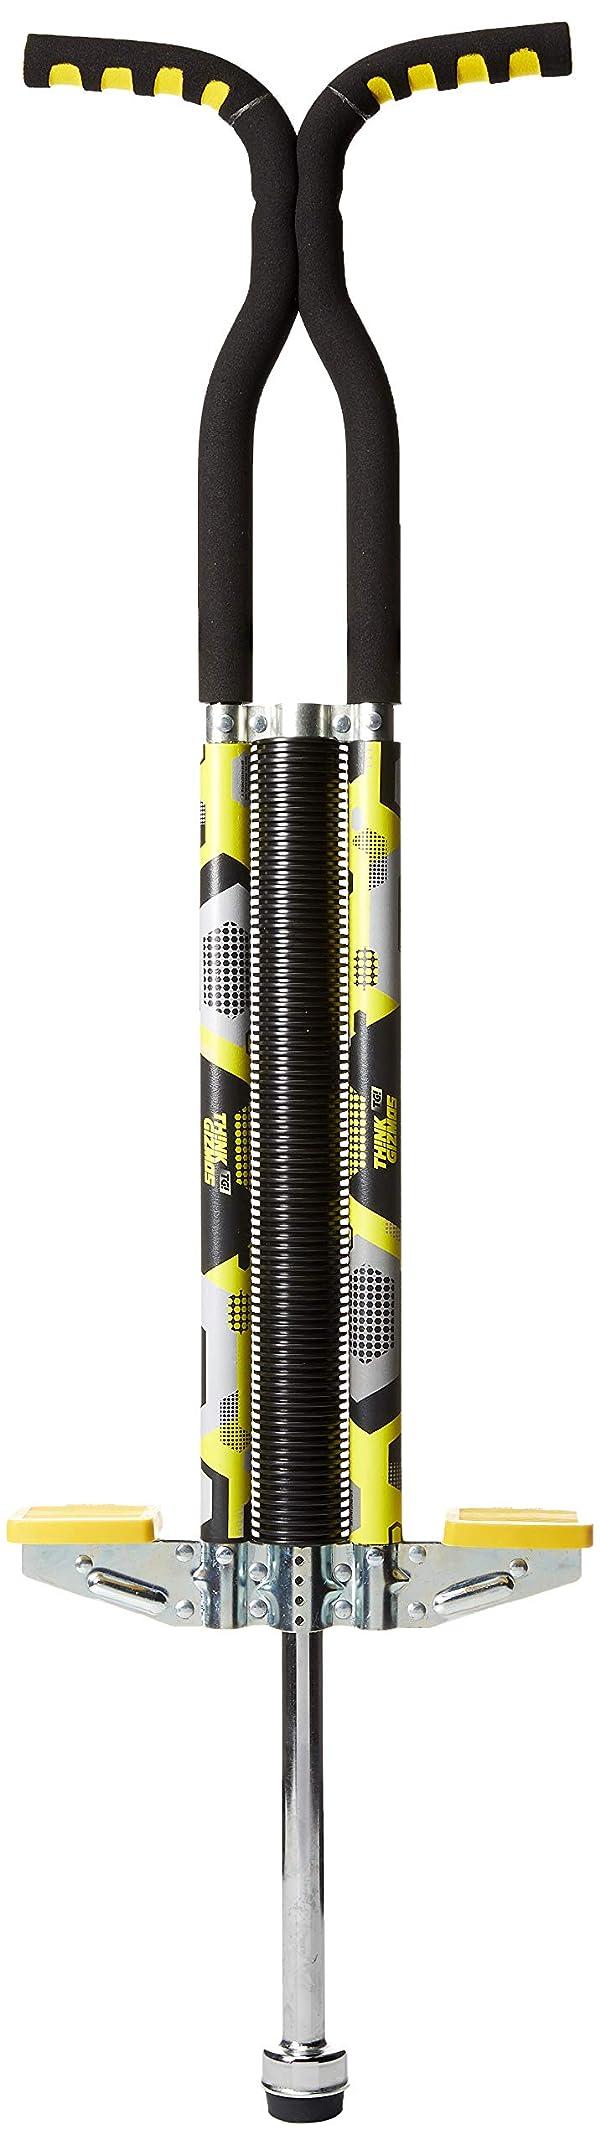 Pogo Stick For Riders 80lbs To 160lbs Aero Legend Pogo Stick For Boys  Girls